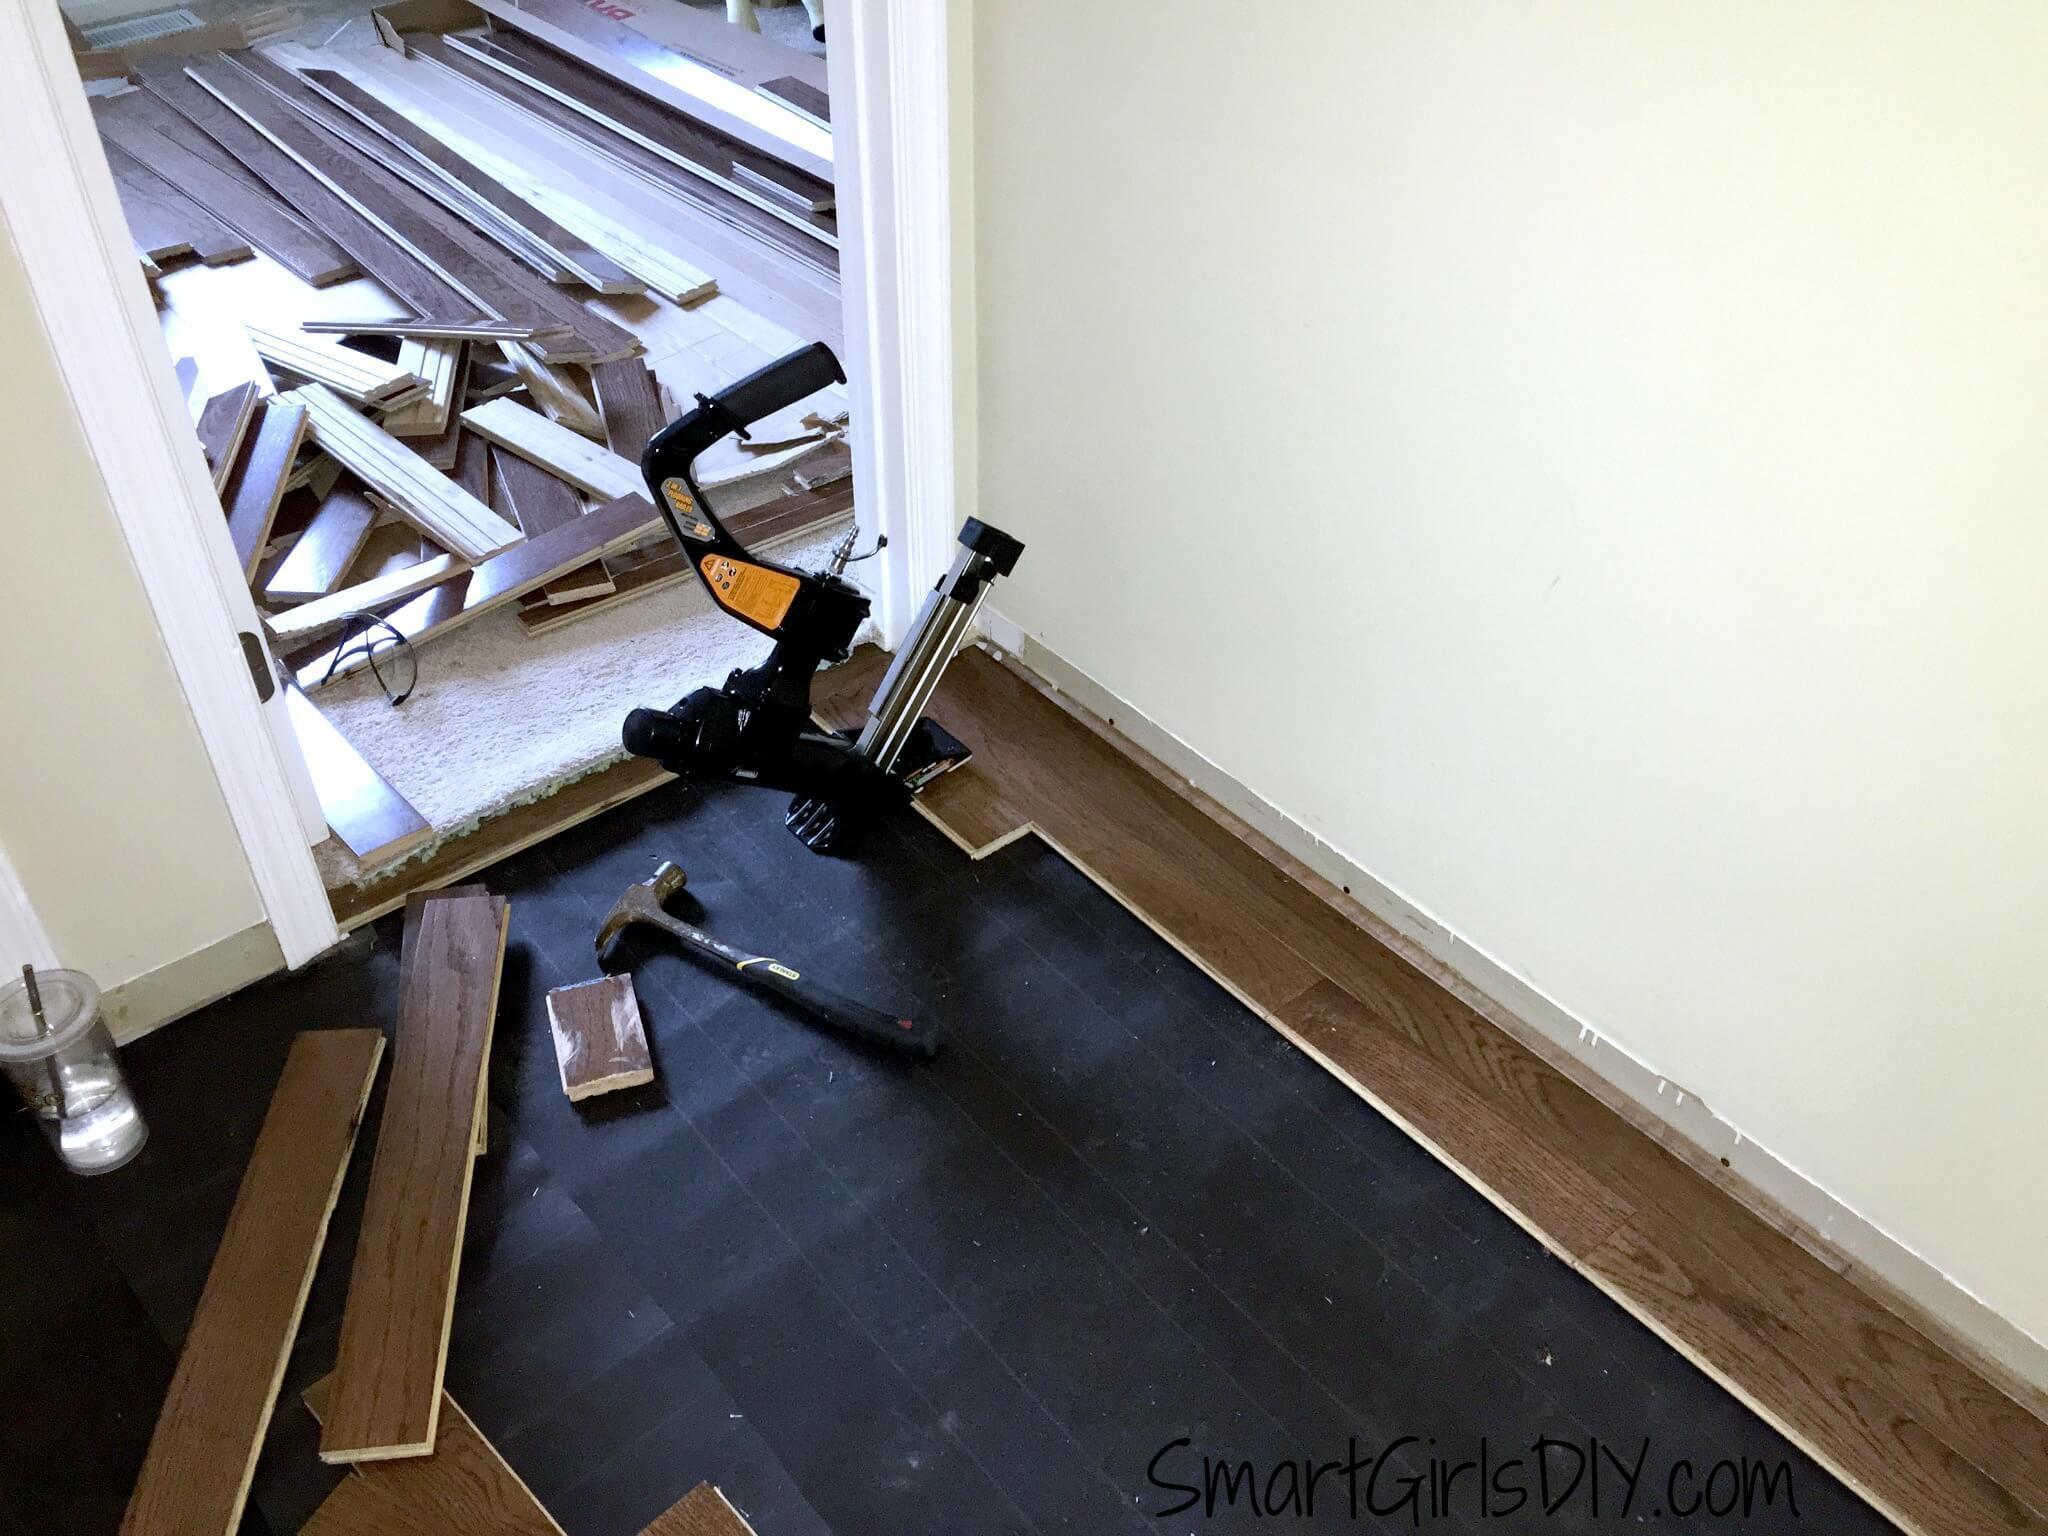 Master Bedroom Hardwood Floors Of Upstairs Hallway 1 Installing Hardwood Floors Pertaining to Third Row Of Hardwood Can now Use the Floor Nailer